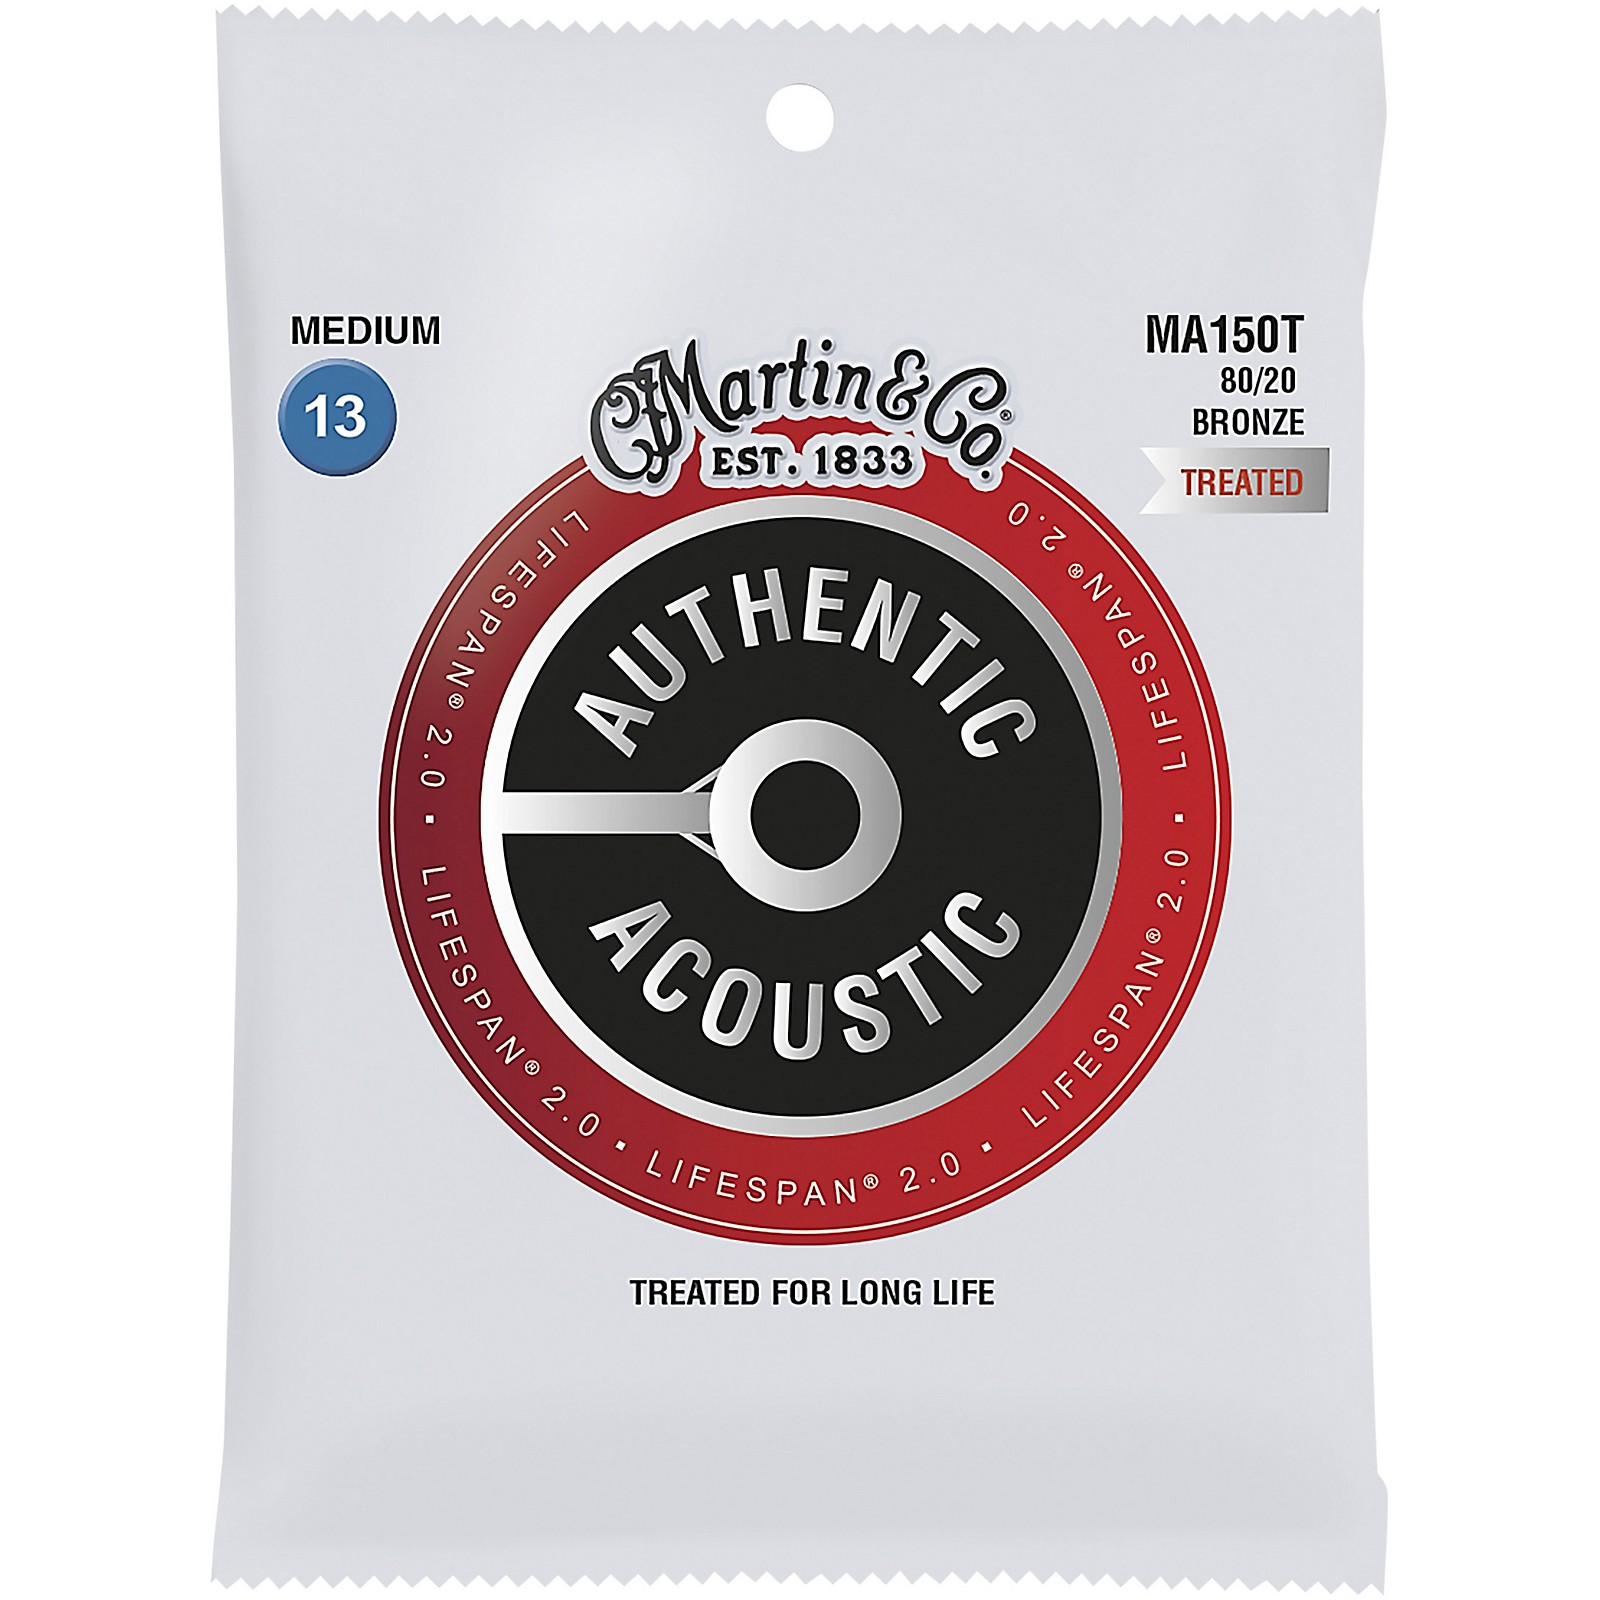 Martin MA150T Lifespan 2.0 80/20 Bronze Medium Authentic Acoustic Guitar Strings